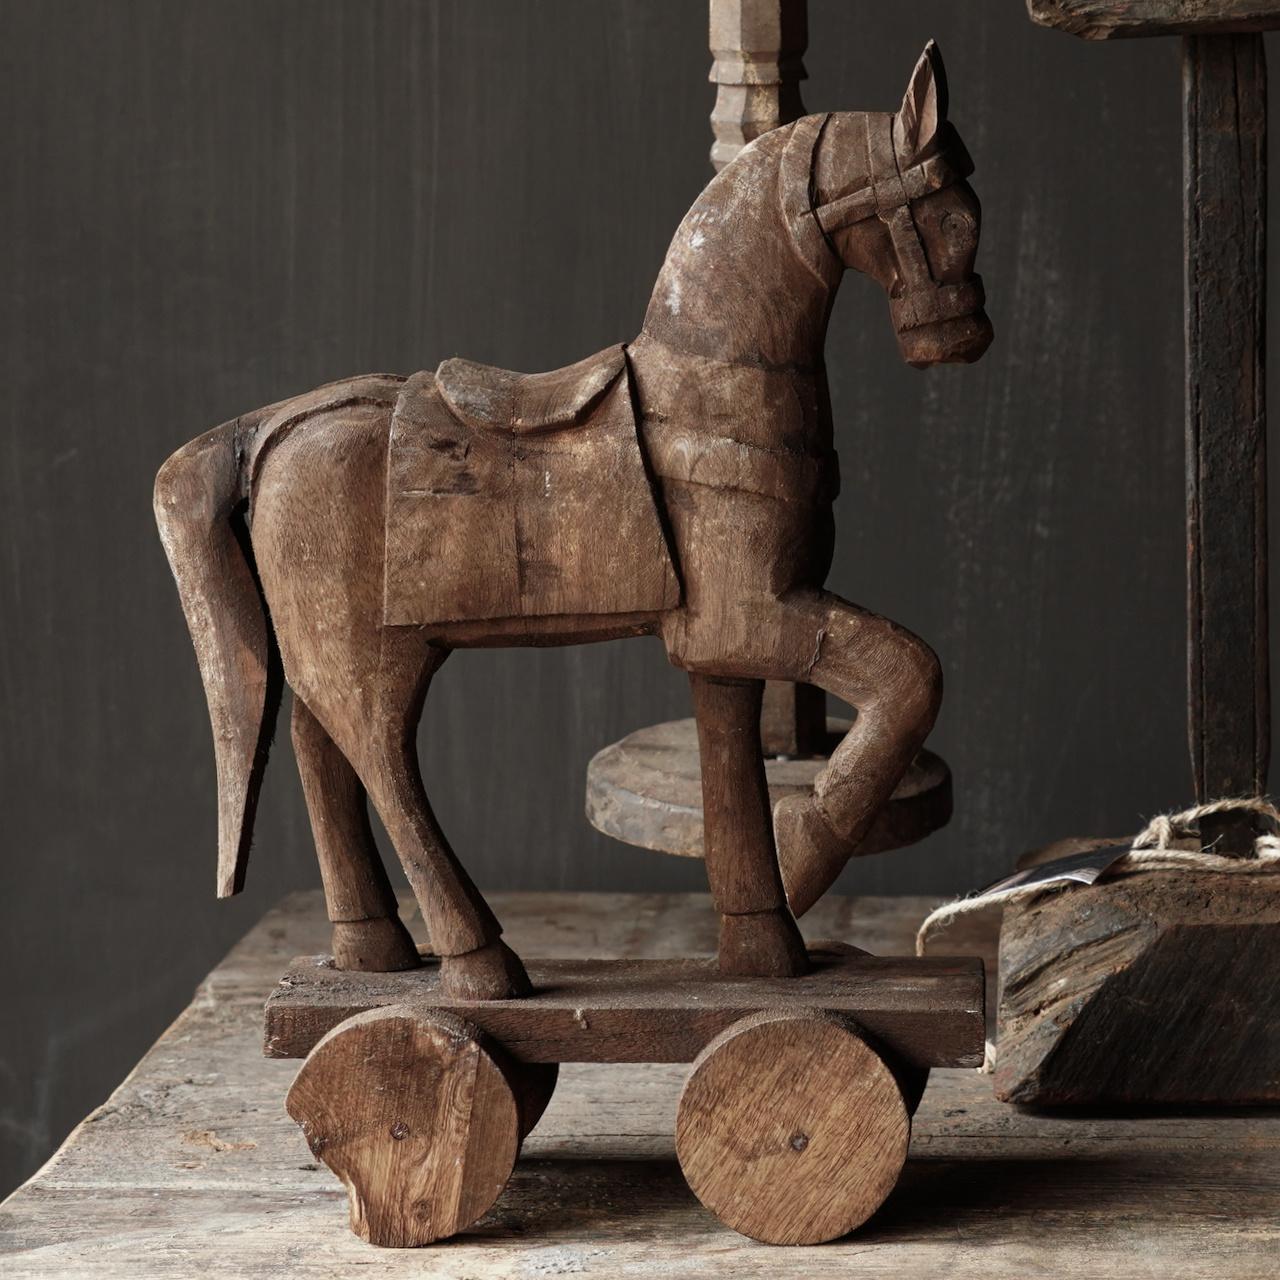 Holzpferd handgefertigt aus altem Holz-3